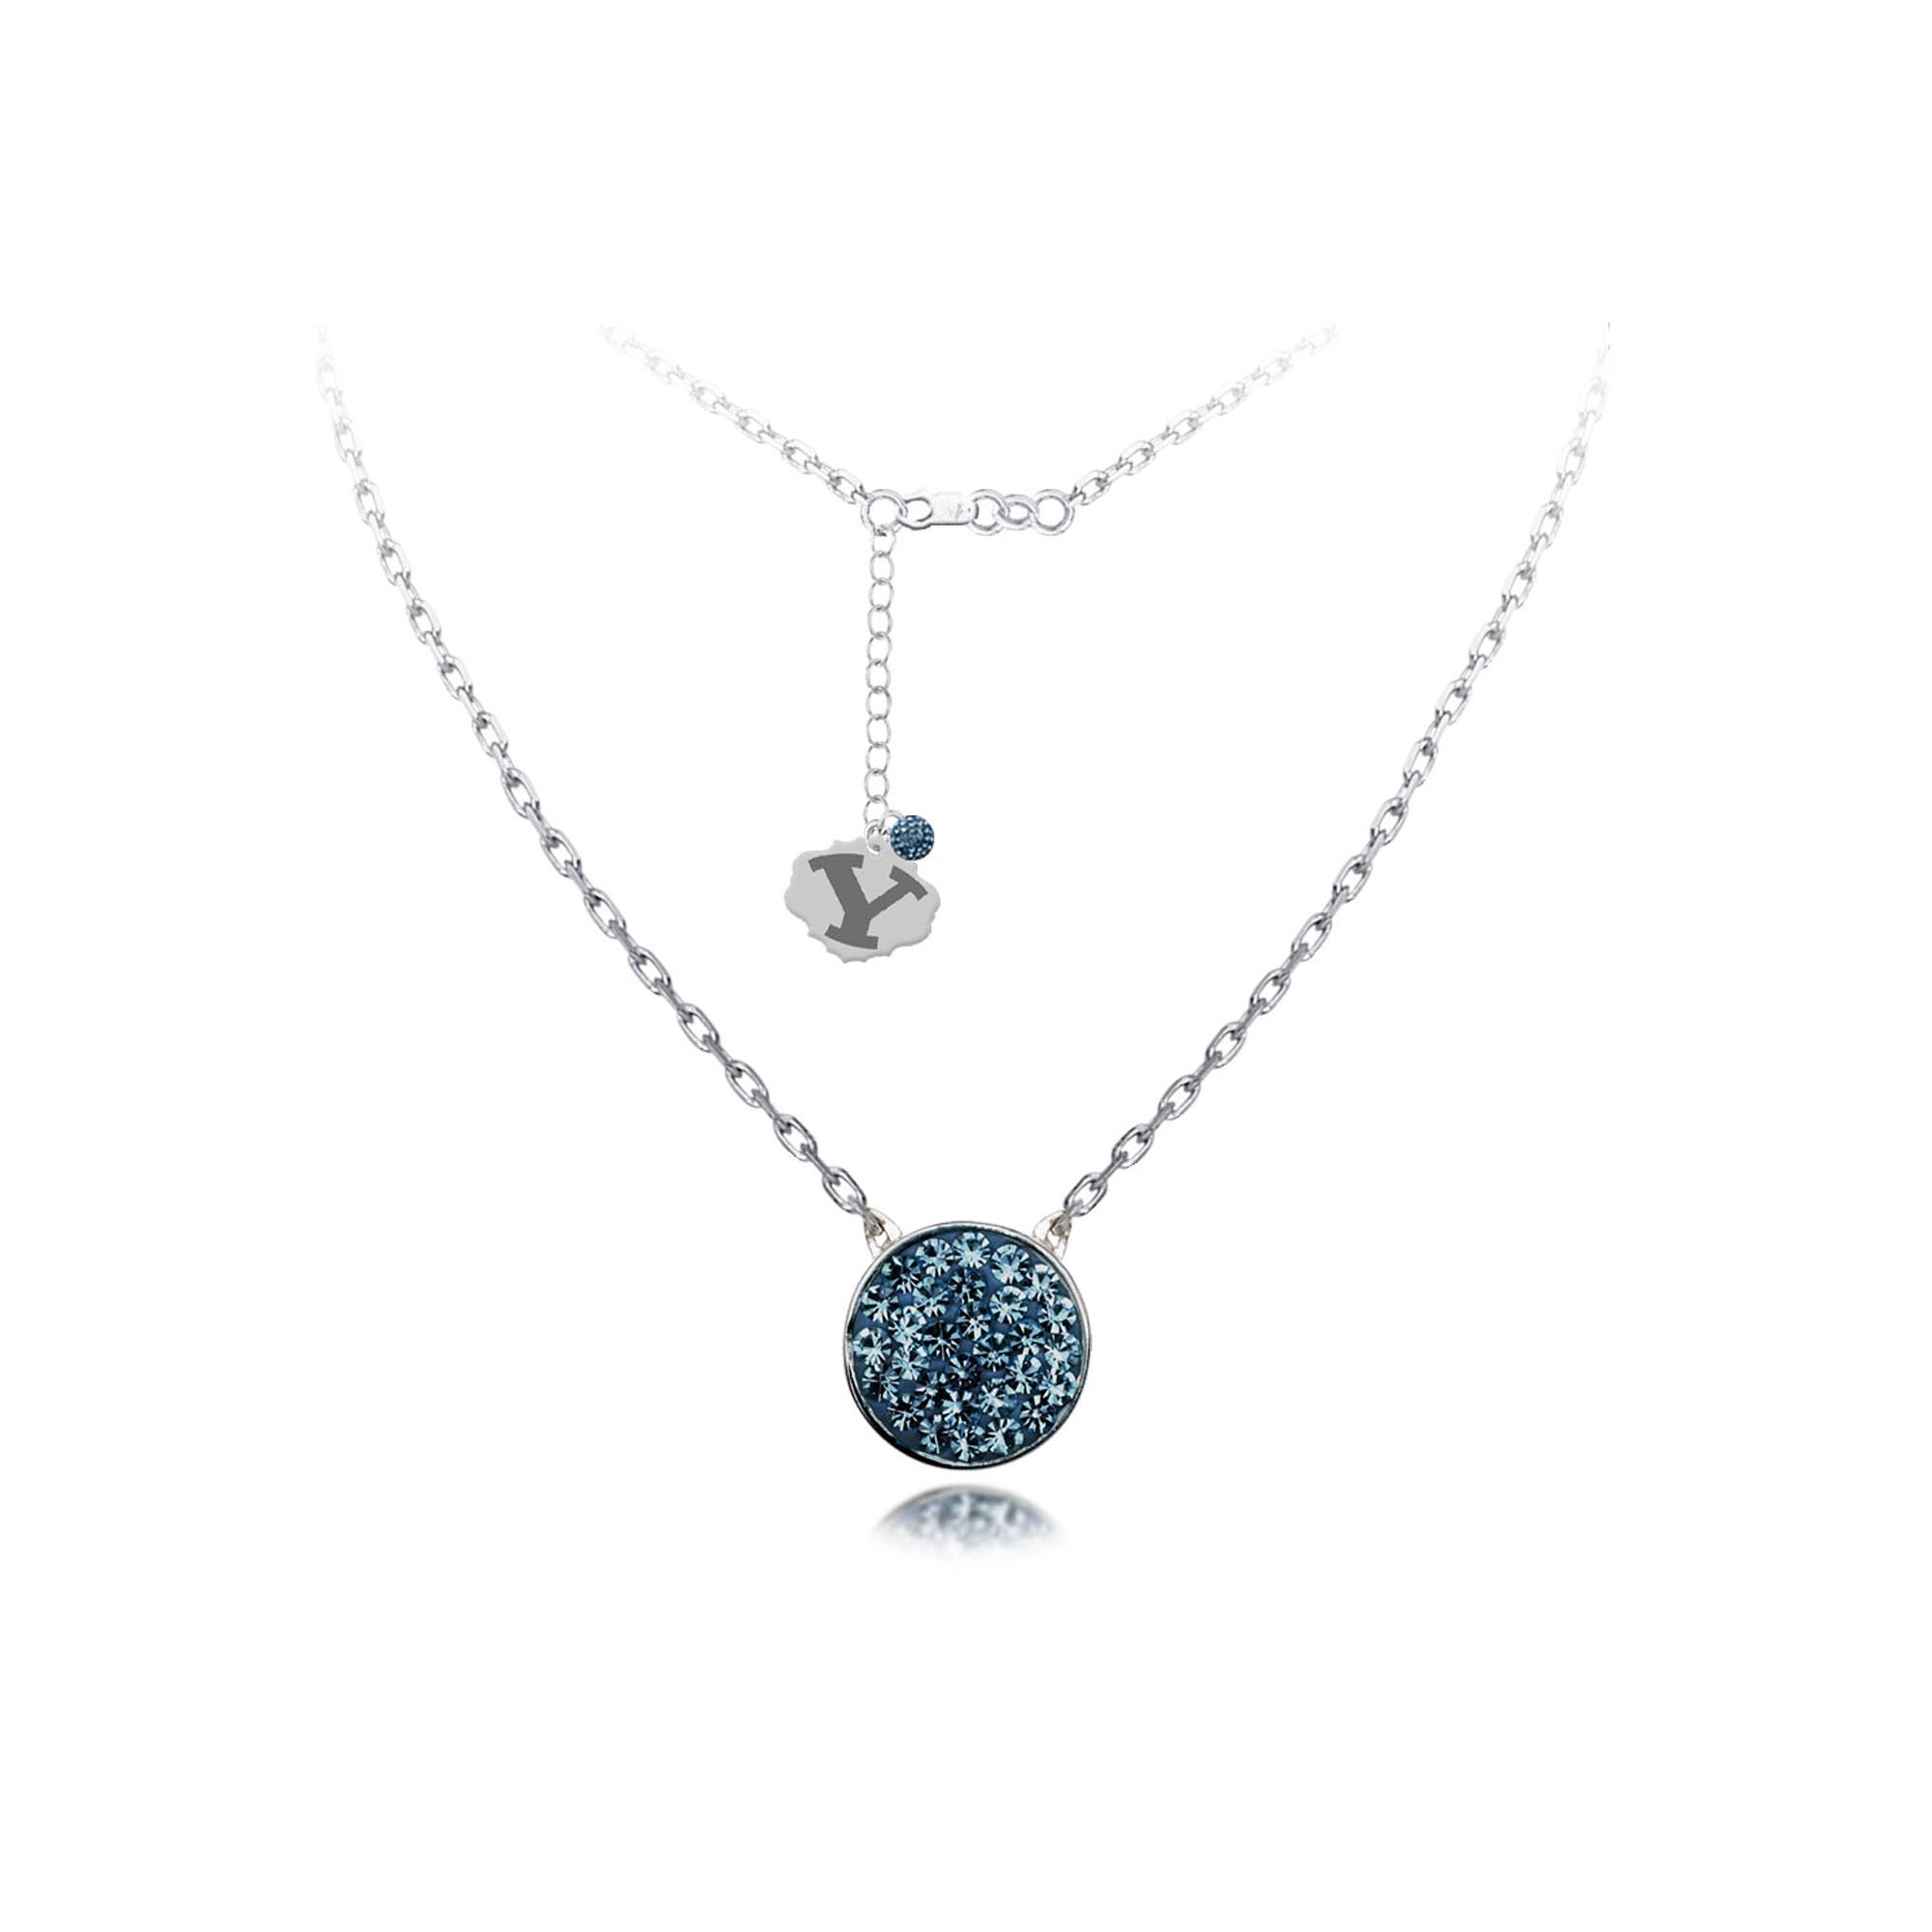 DiamondJewelryNY Silver Pendant, Spirit Disc Nk/Brigham Young Univ